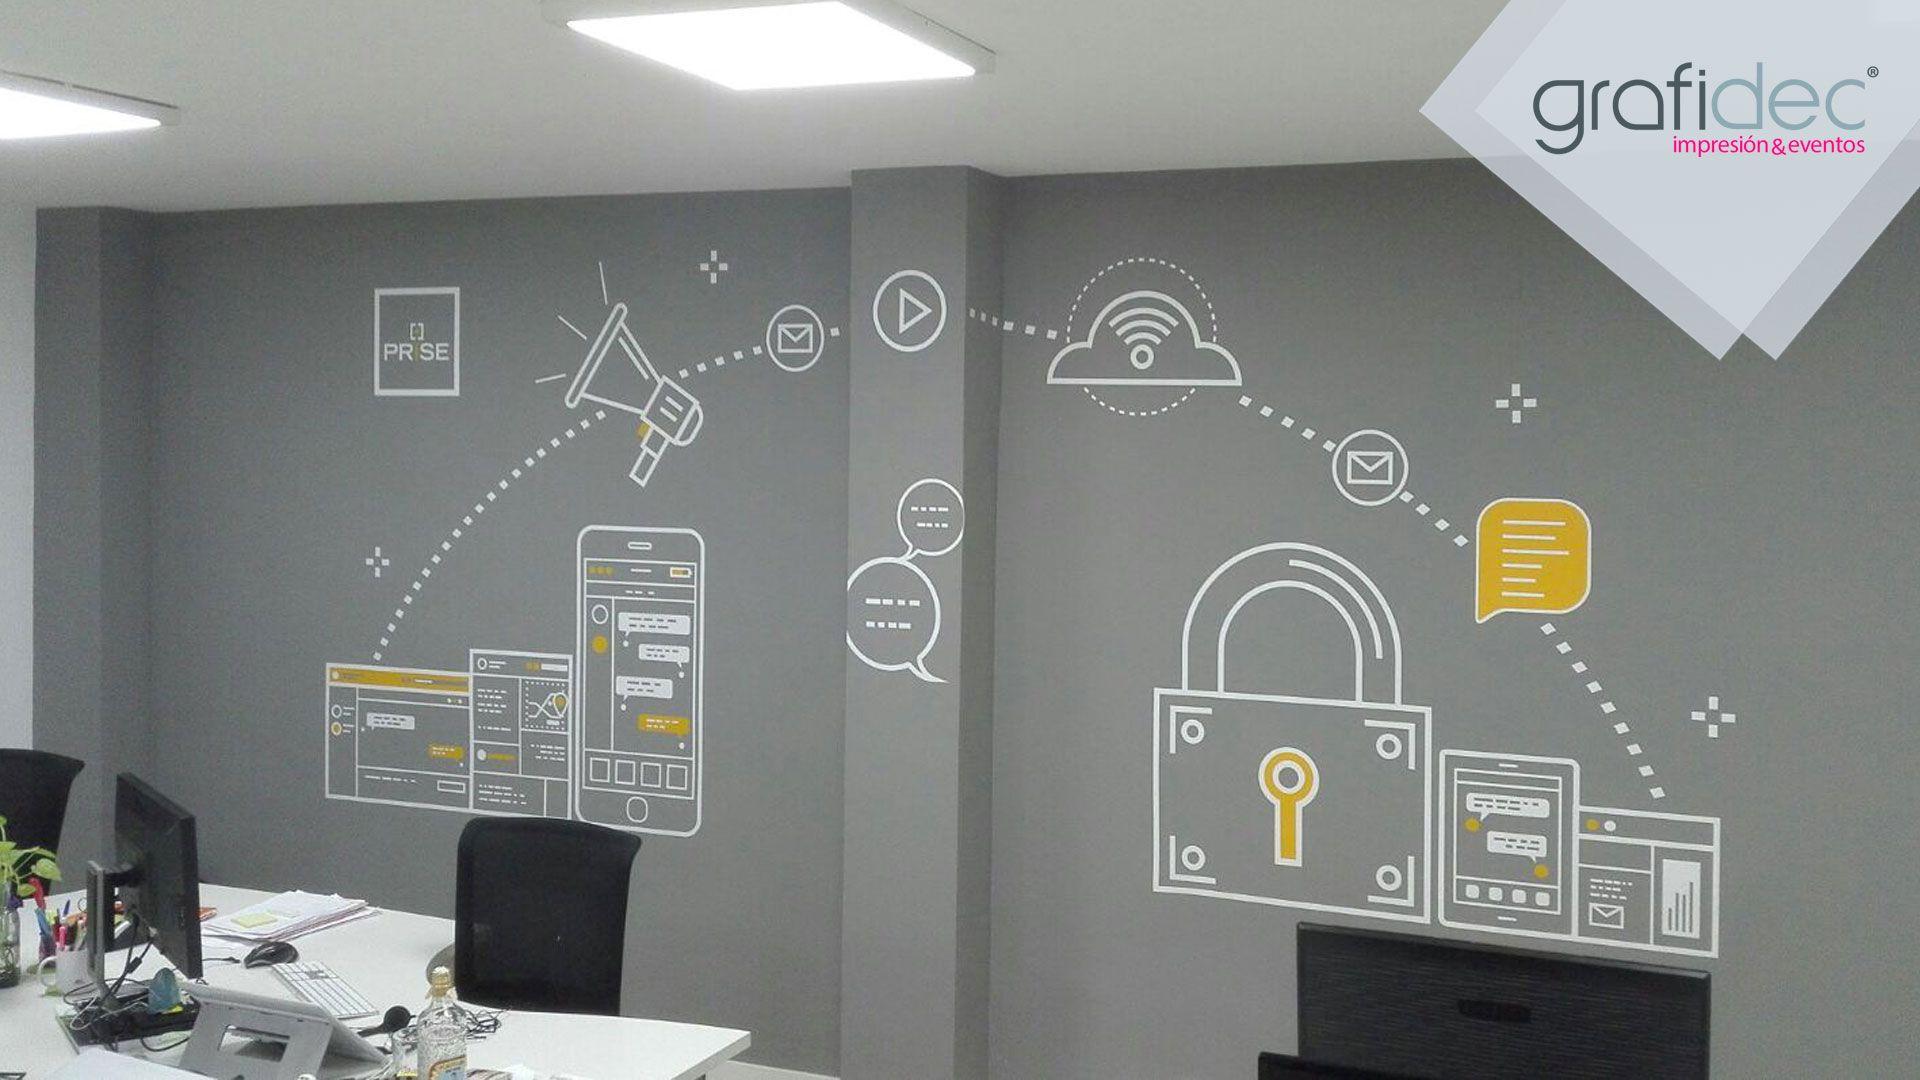 decoracion-oficina-PRISE-grafidec